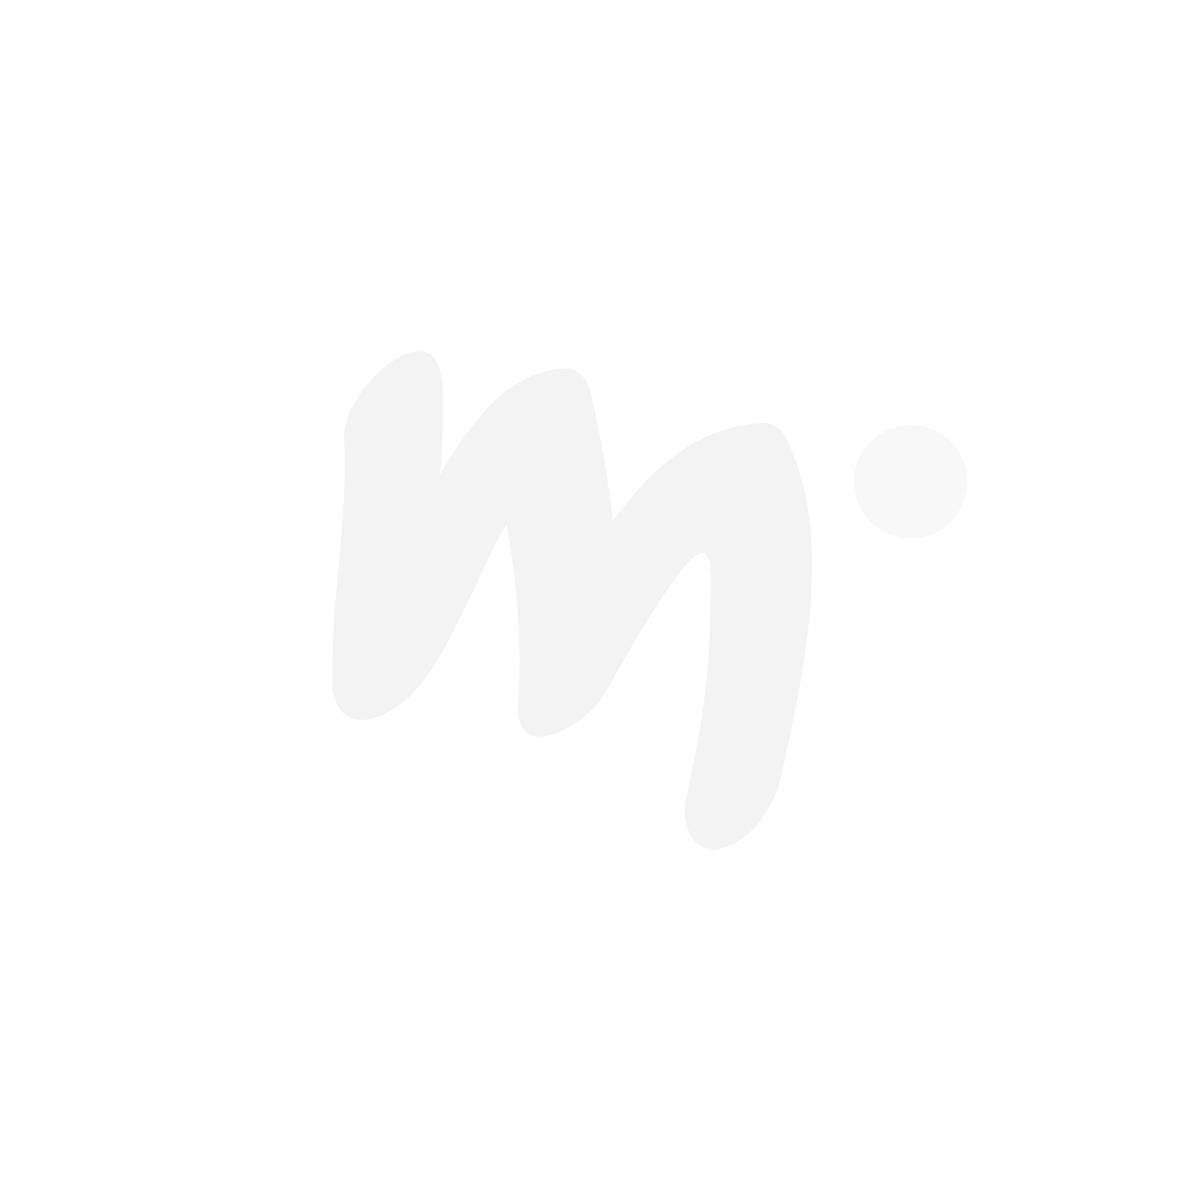 Peppi Pitkätossu Huvikummussa-mekko oranssi